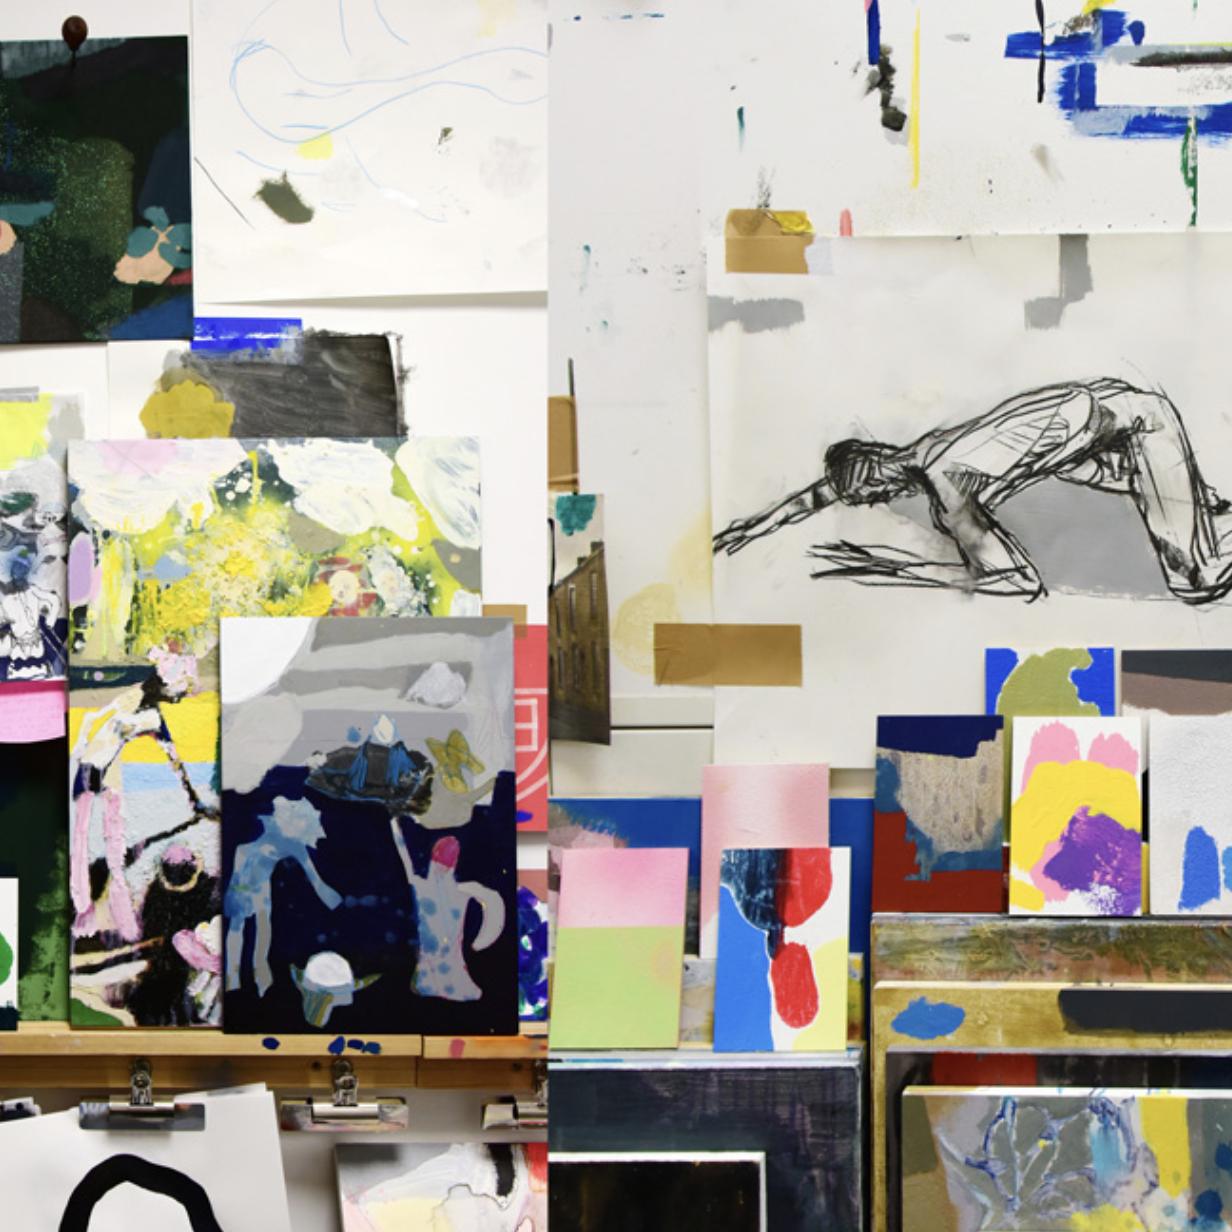 Russell John's studio